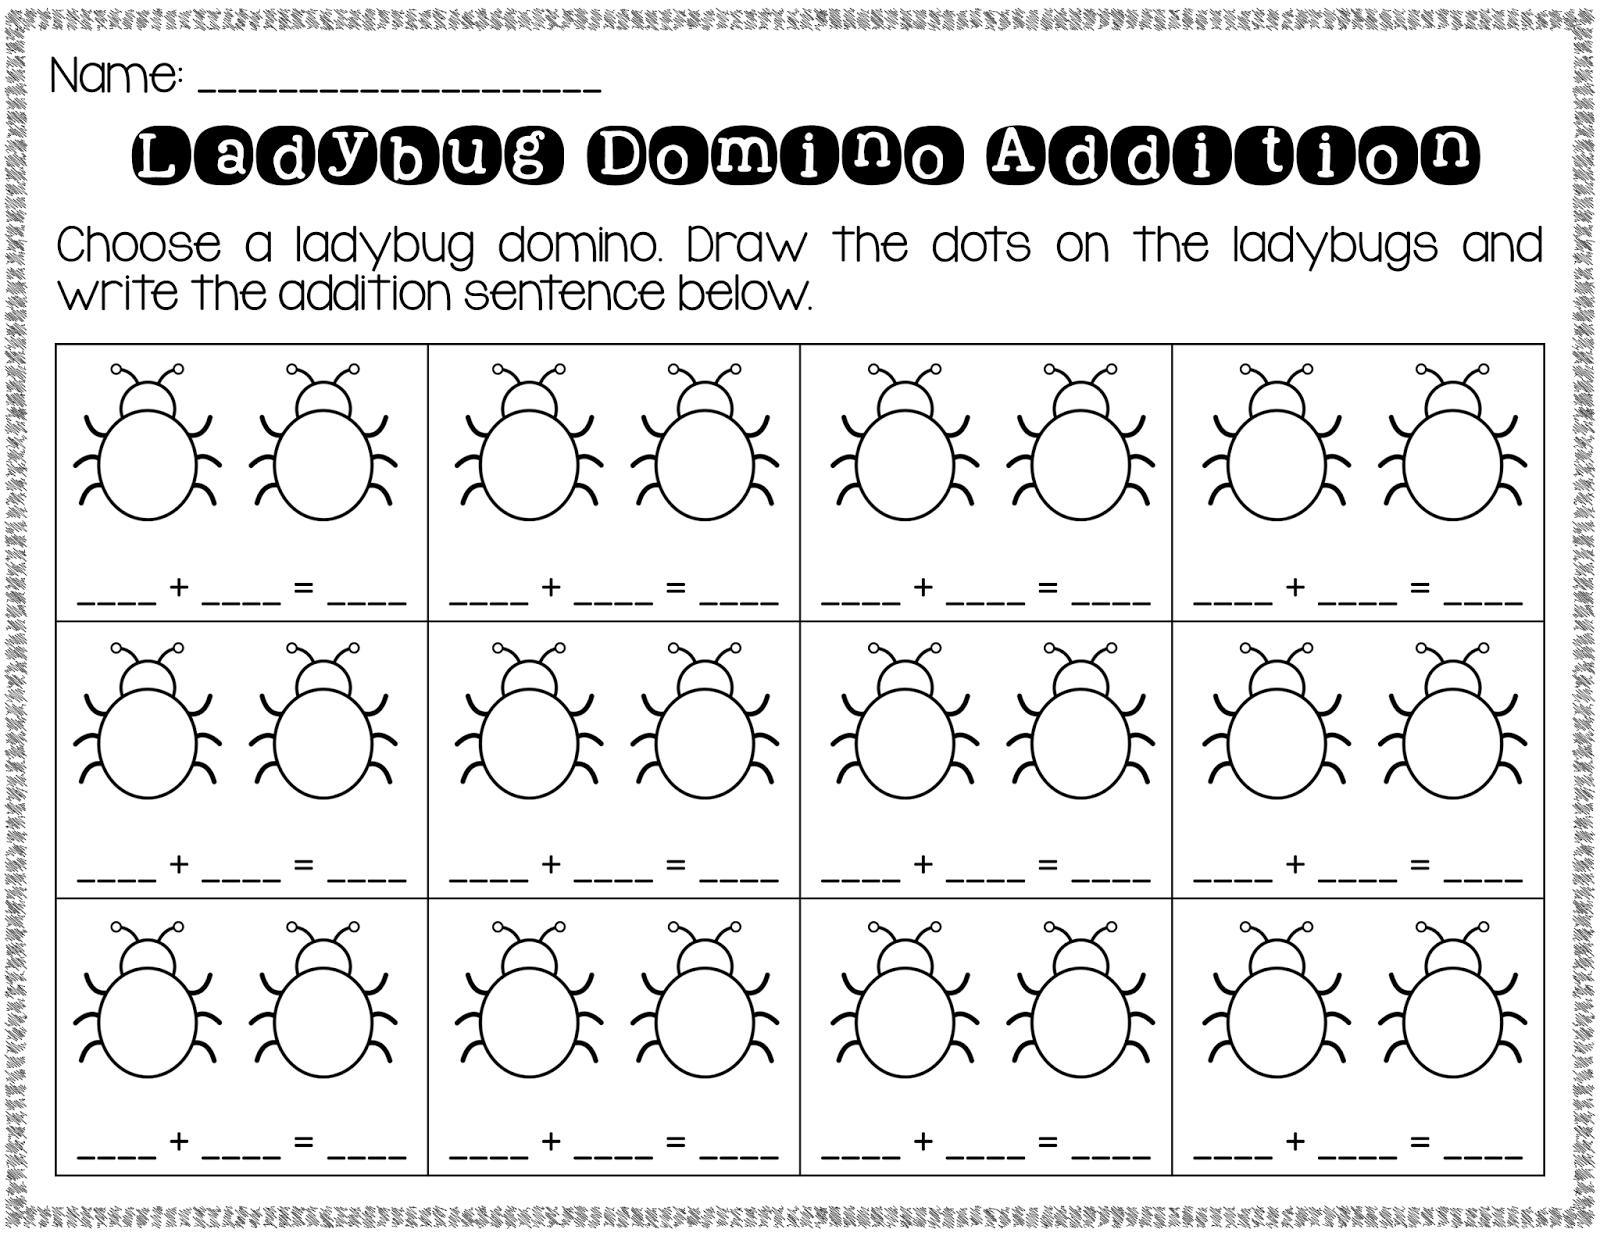 math worksheet : domino addition worksheet blank  worksheets for education : Dominoes Math Worksheets